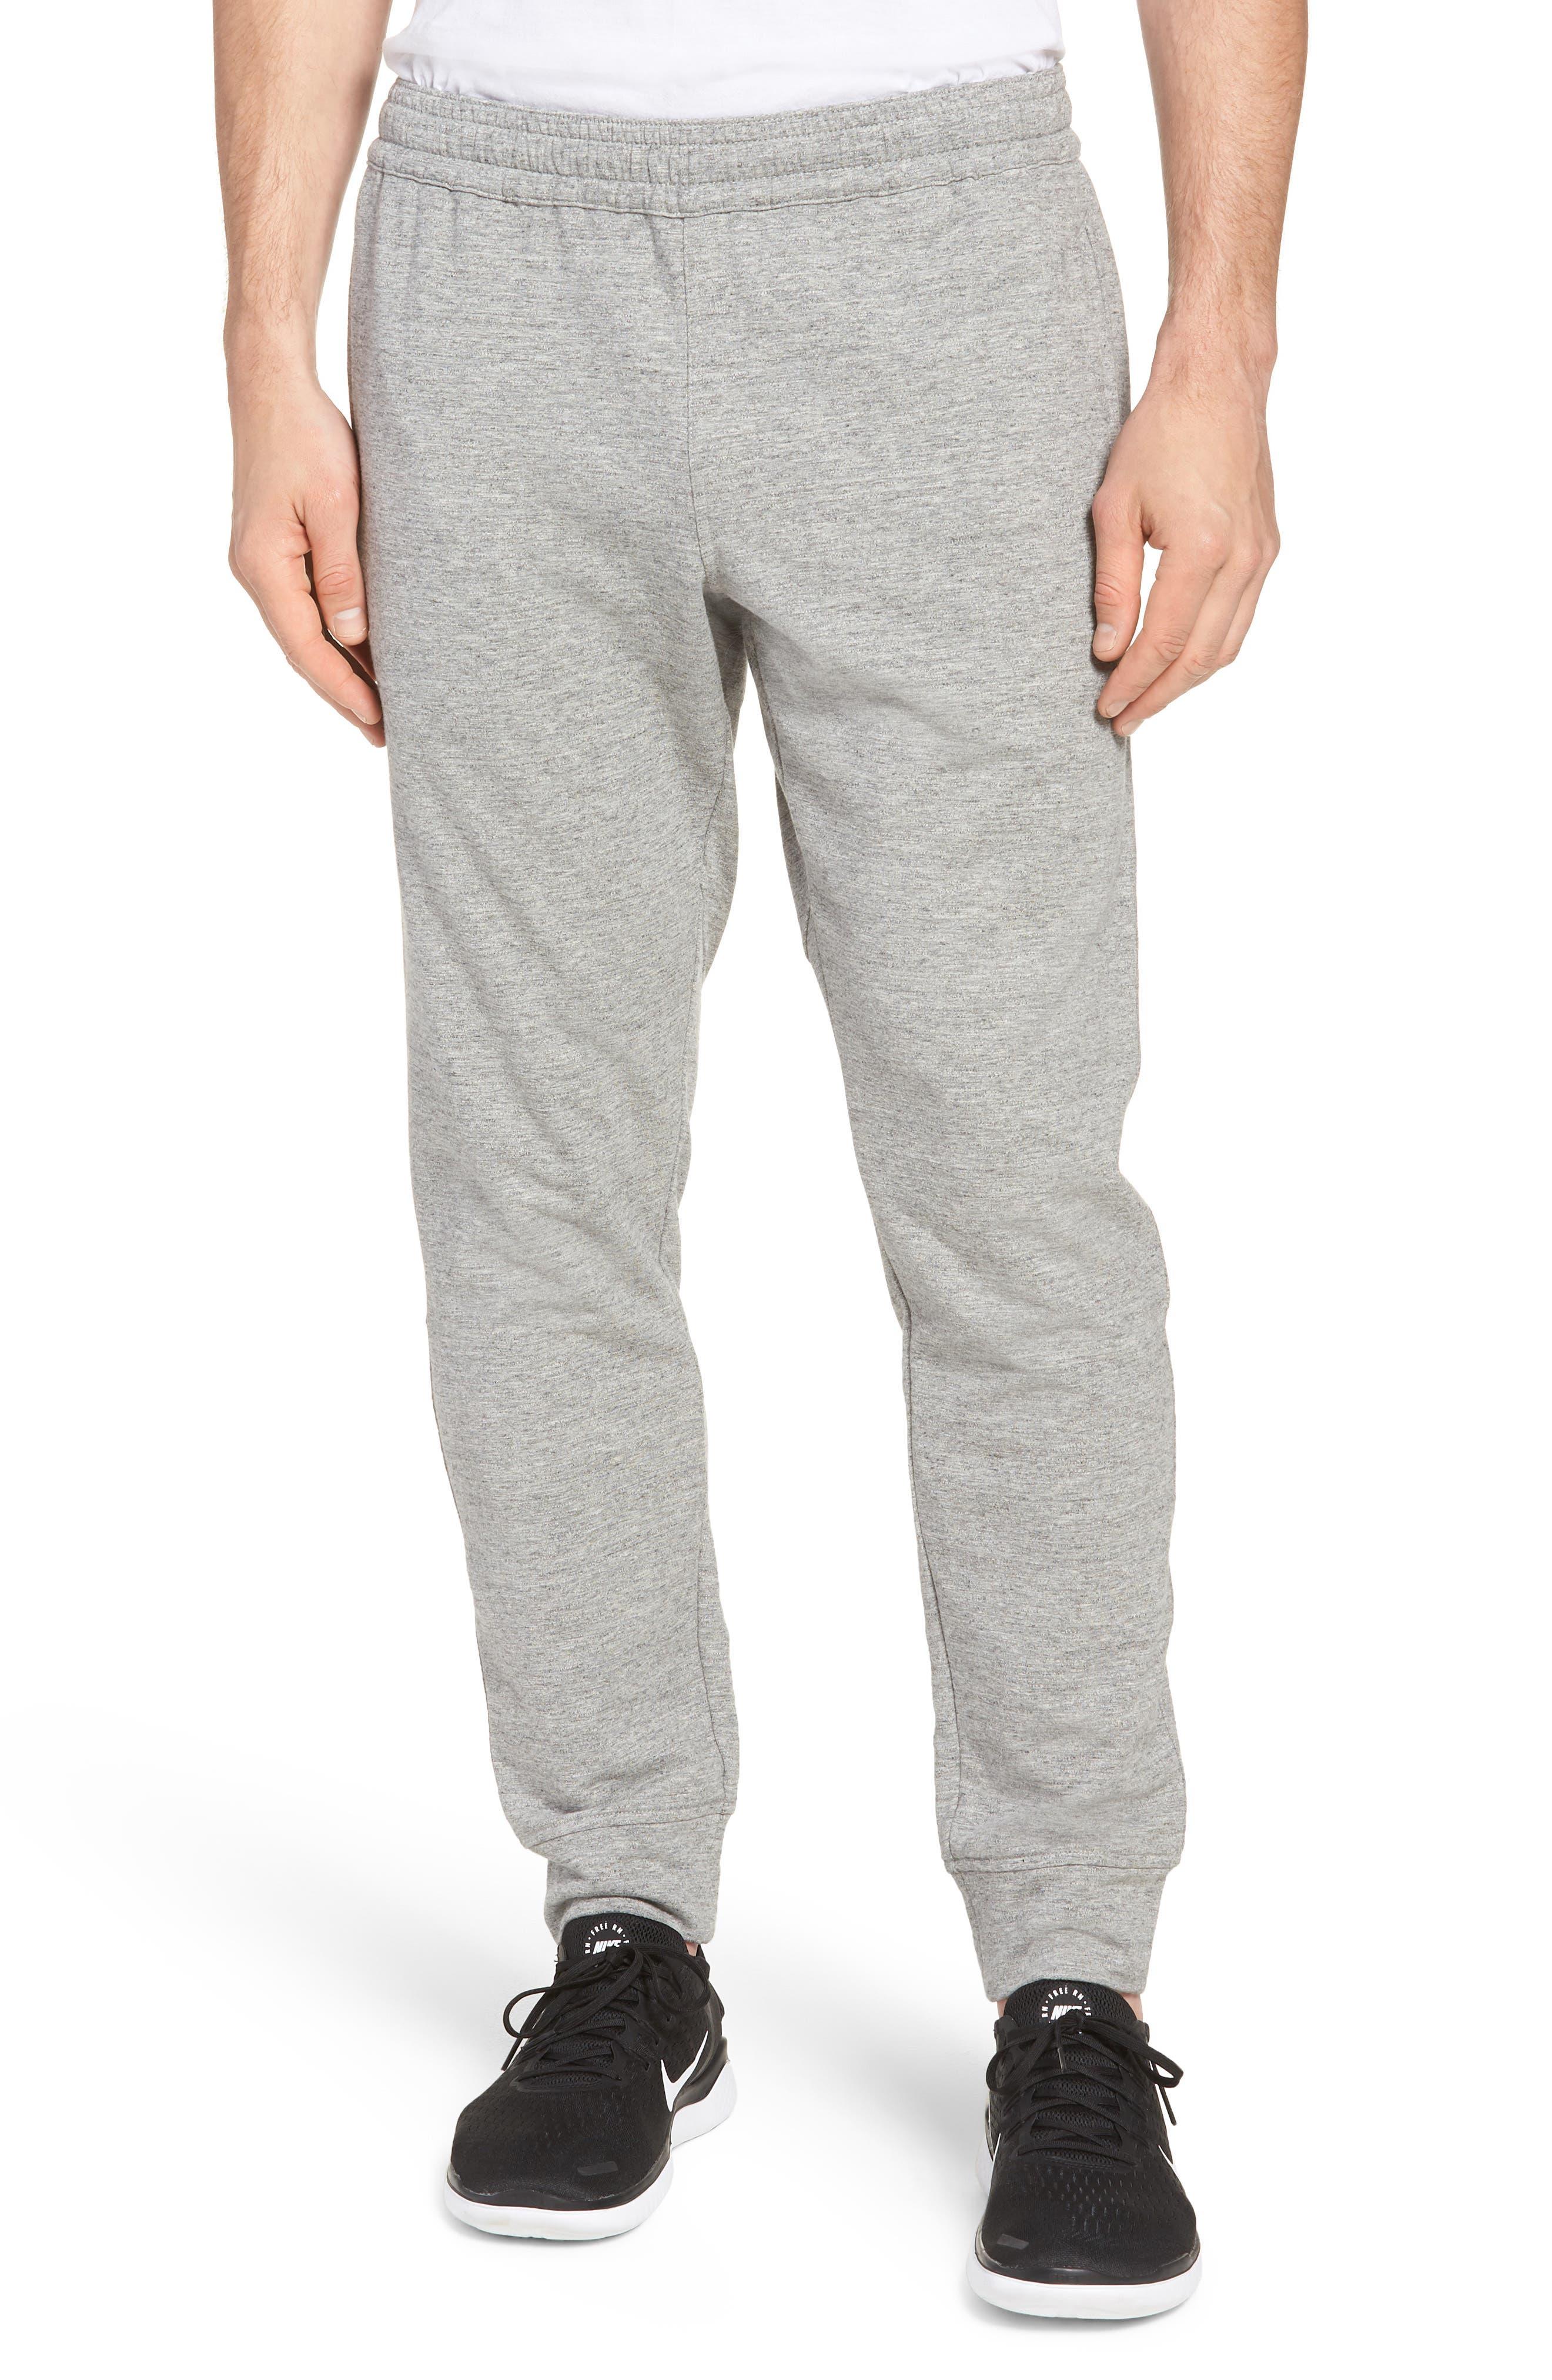 Arcanite Jogger Pants,                         Main,                         color, GREY WOLF MELANGE